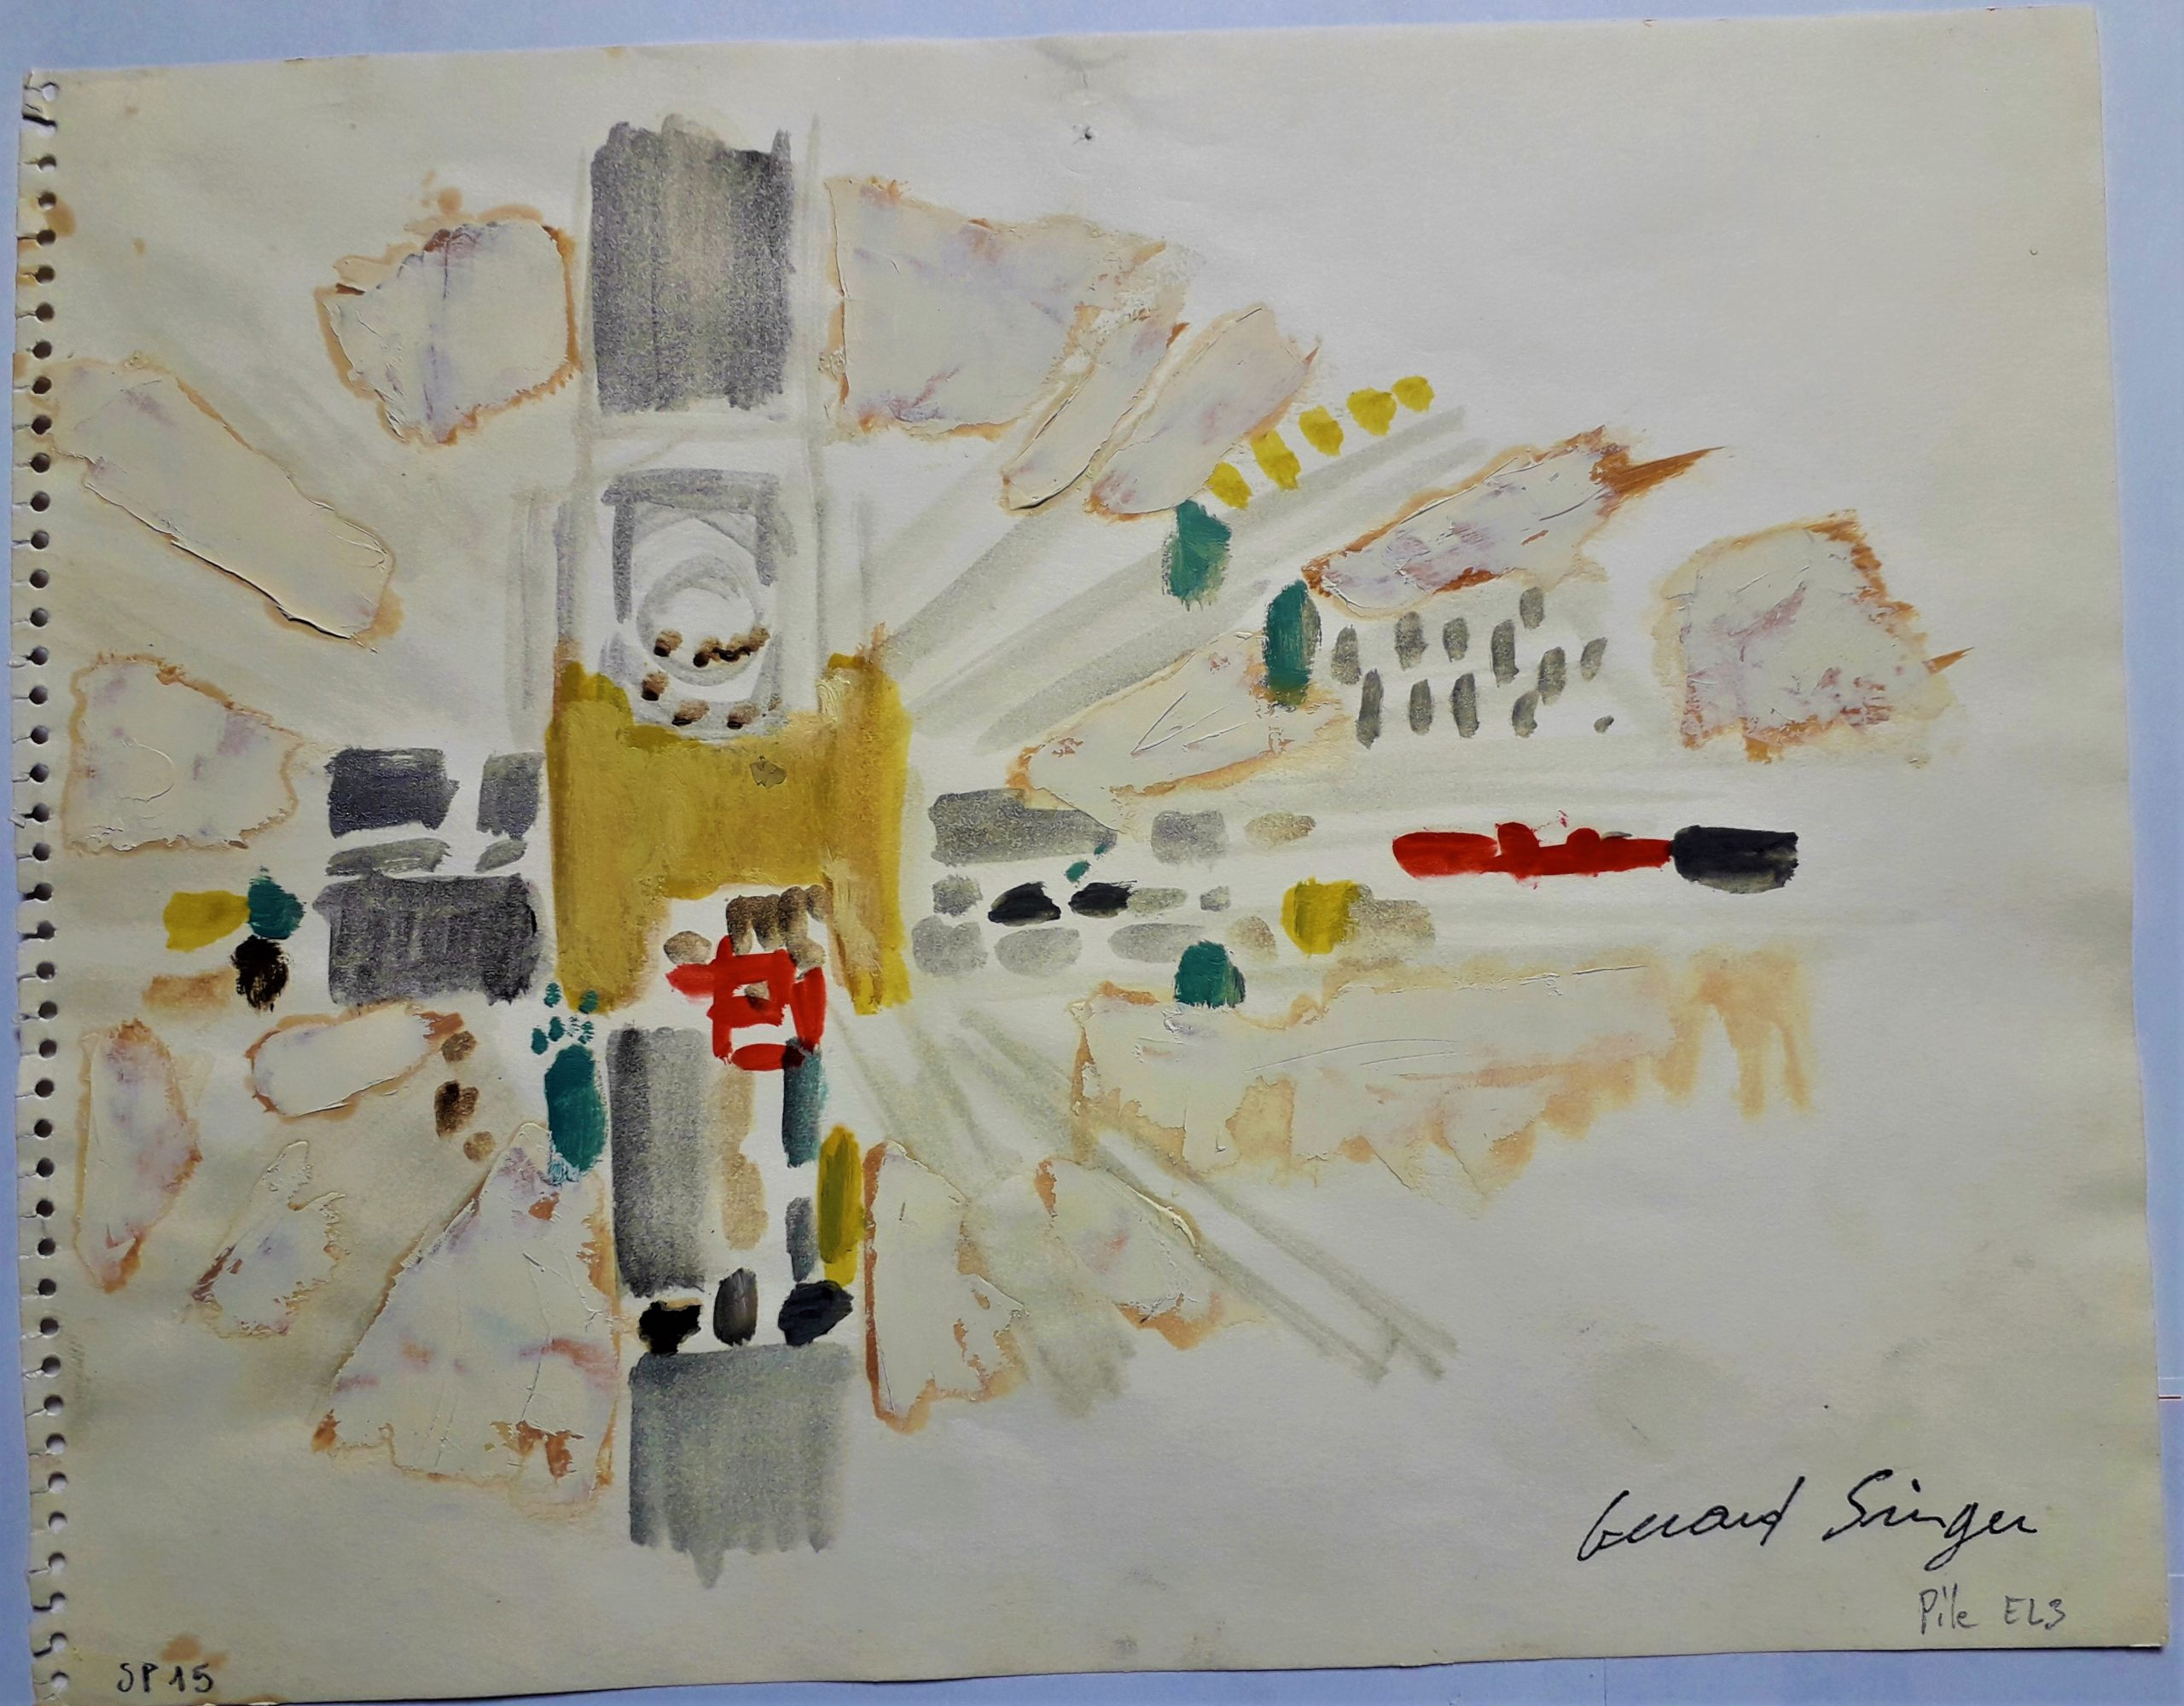 singer-gerard-pile-EL3-saclay-sp15